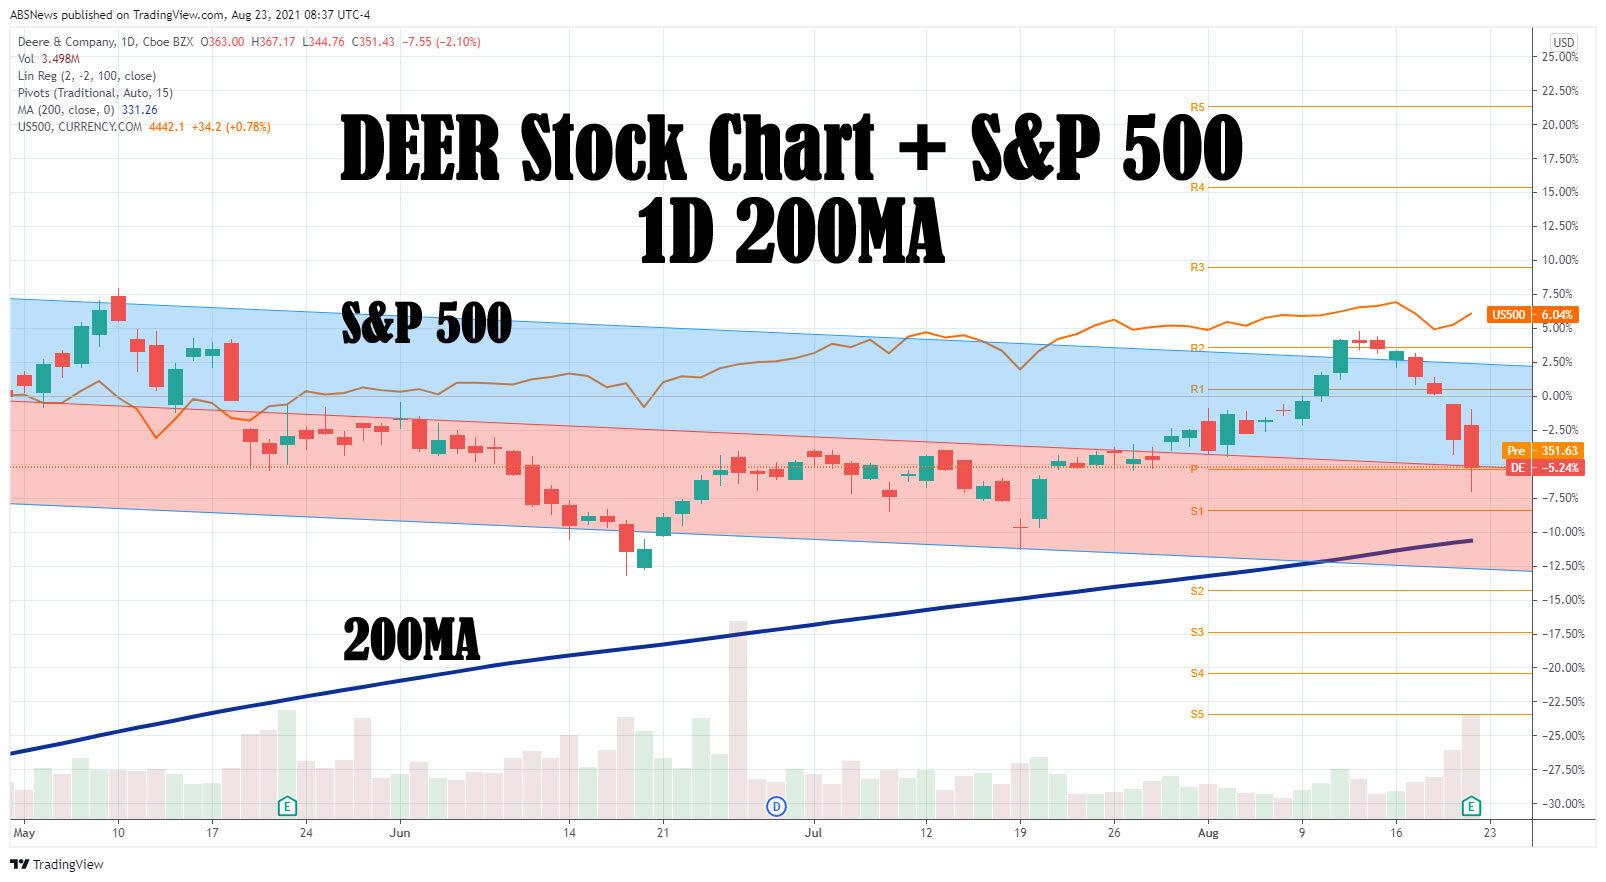 64db265c-22b2-11eb-a3d0-06b4694bee2a%2F1629723463158-deere+stock+chart.jpg